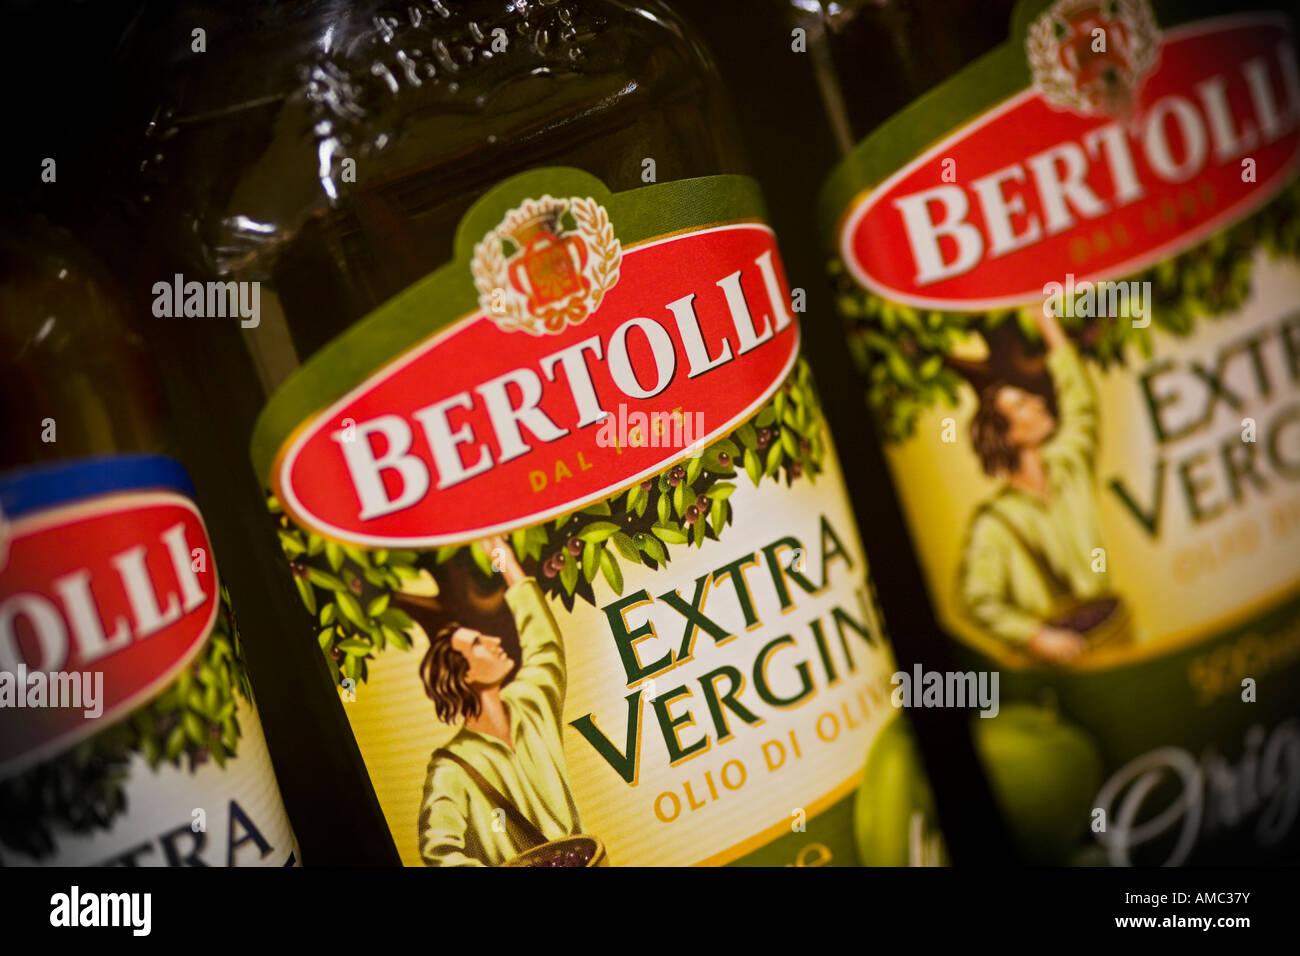 Bertolli olive oil bottles Bertolli is a Unilever brand - Stock Image